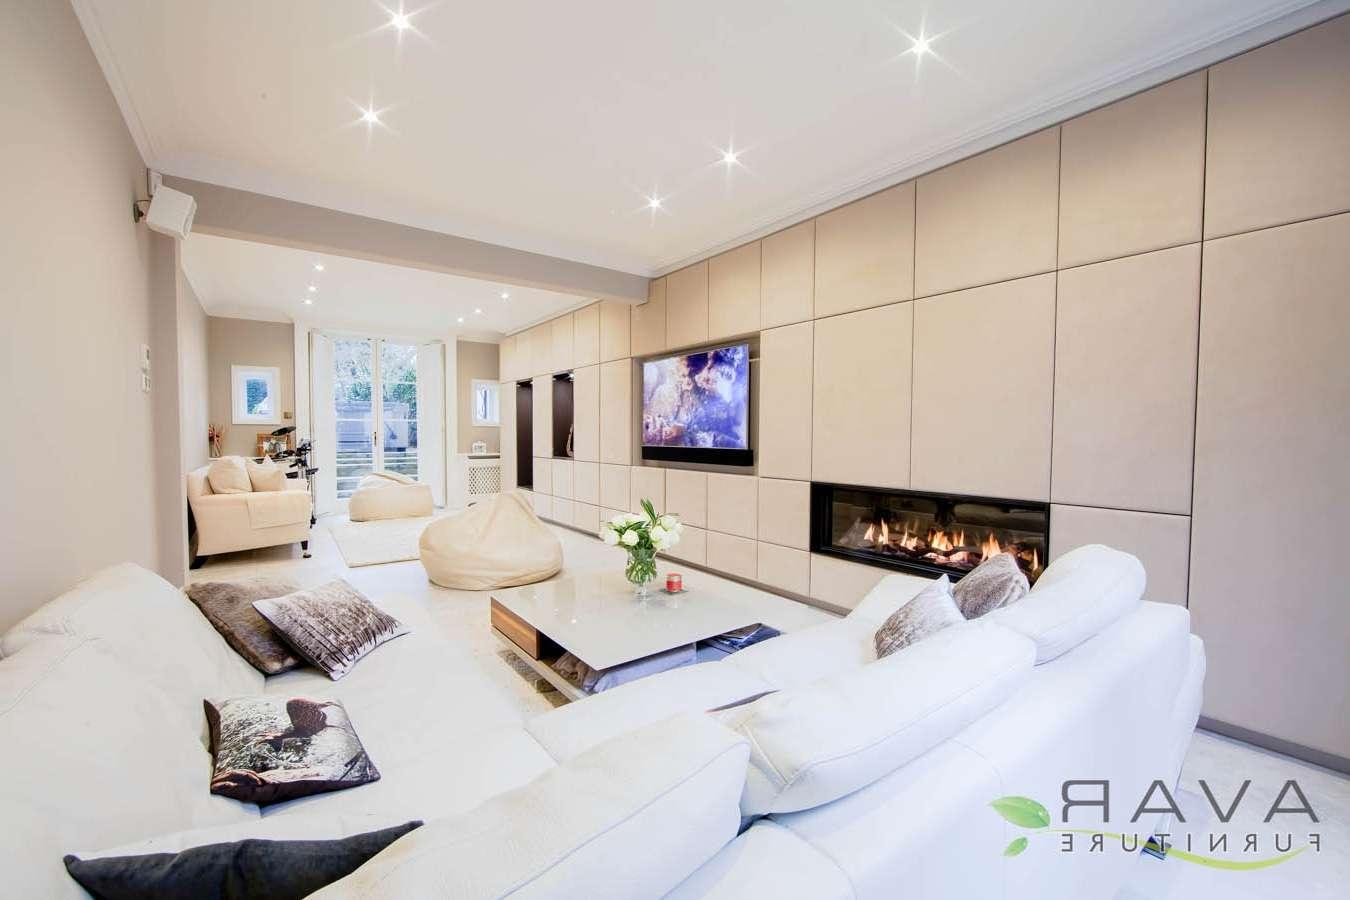 Ƹӝʒ Bespoke Tv/entertainment Units | North London, Uk | Avar Furniture Throughout Bespoke Tv Cabinets (View 12 of 20)